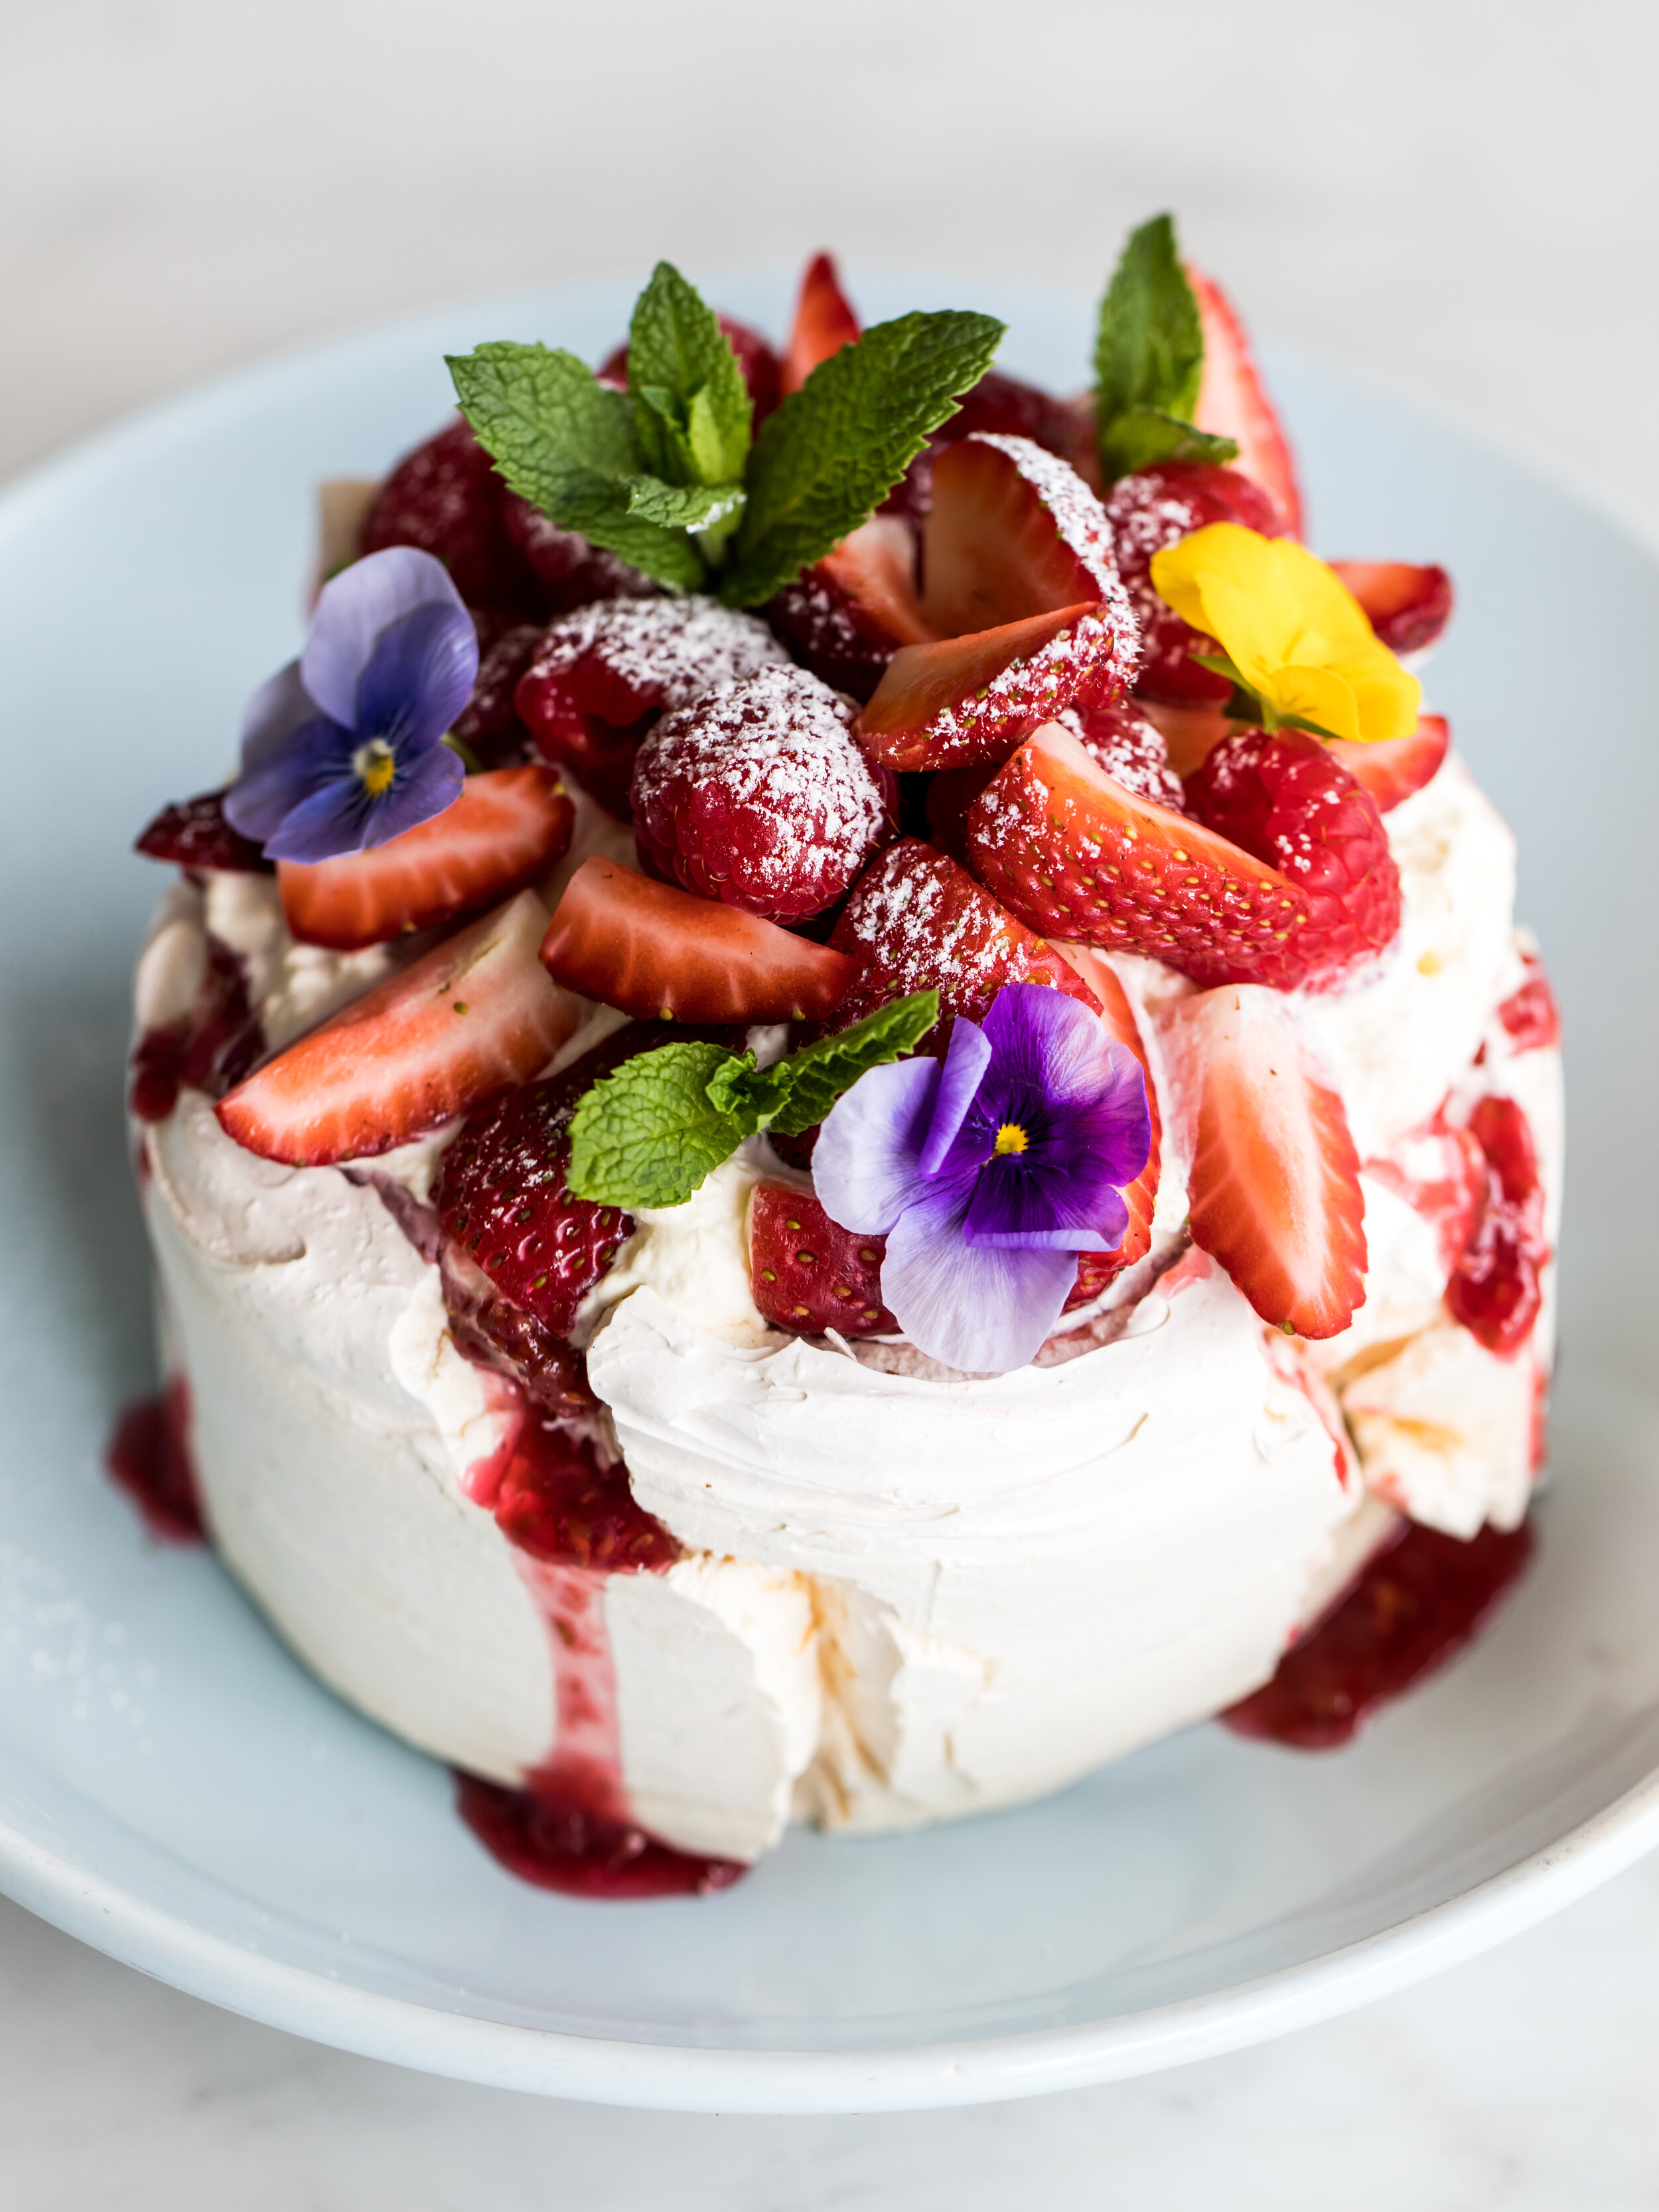 On the menu at The Boathouse Hotel Patonga: Patonga pavlova with fresh berries, coulis + cream.